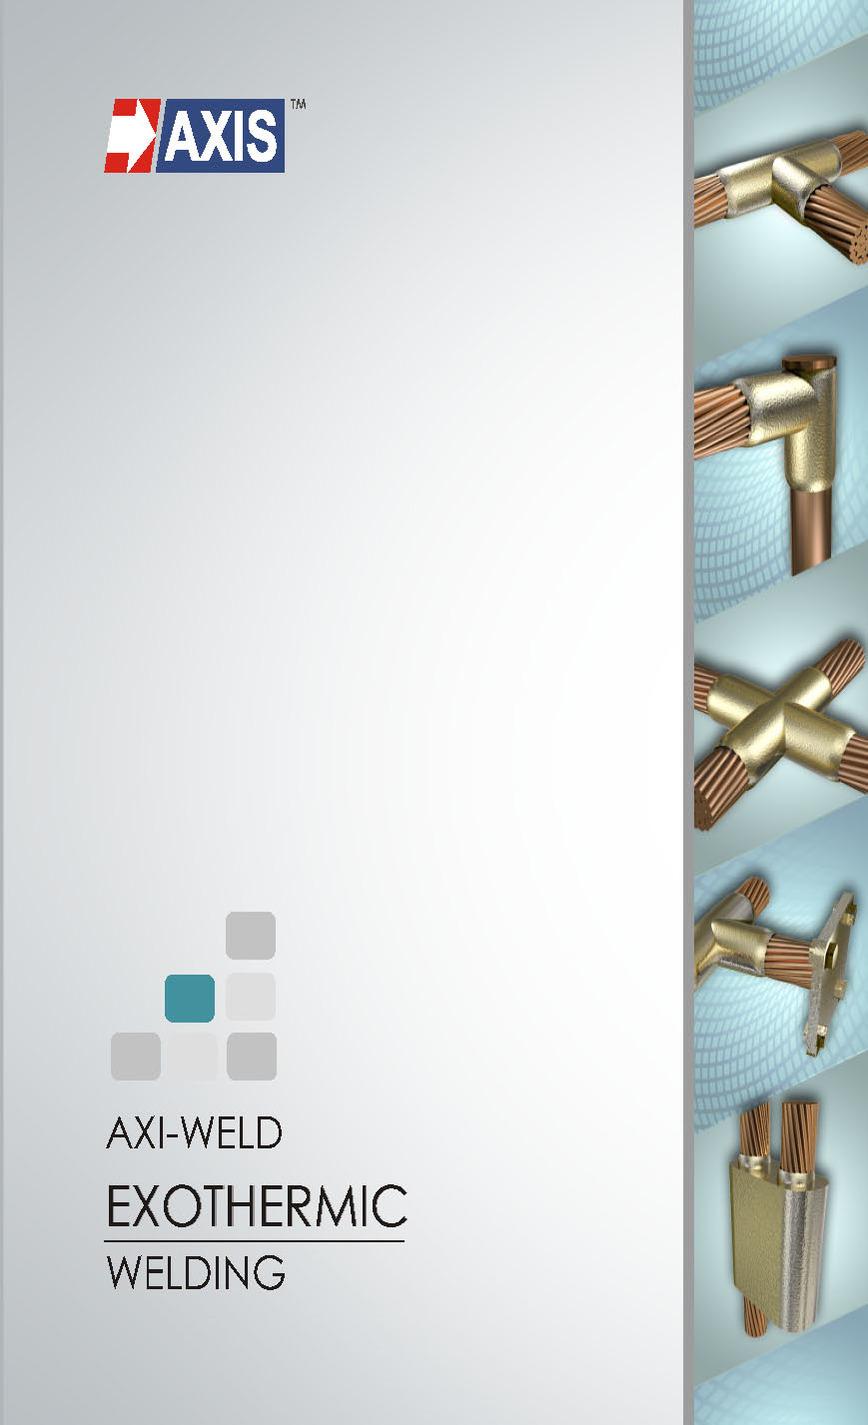 Logo Exothermic welding materials